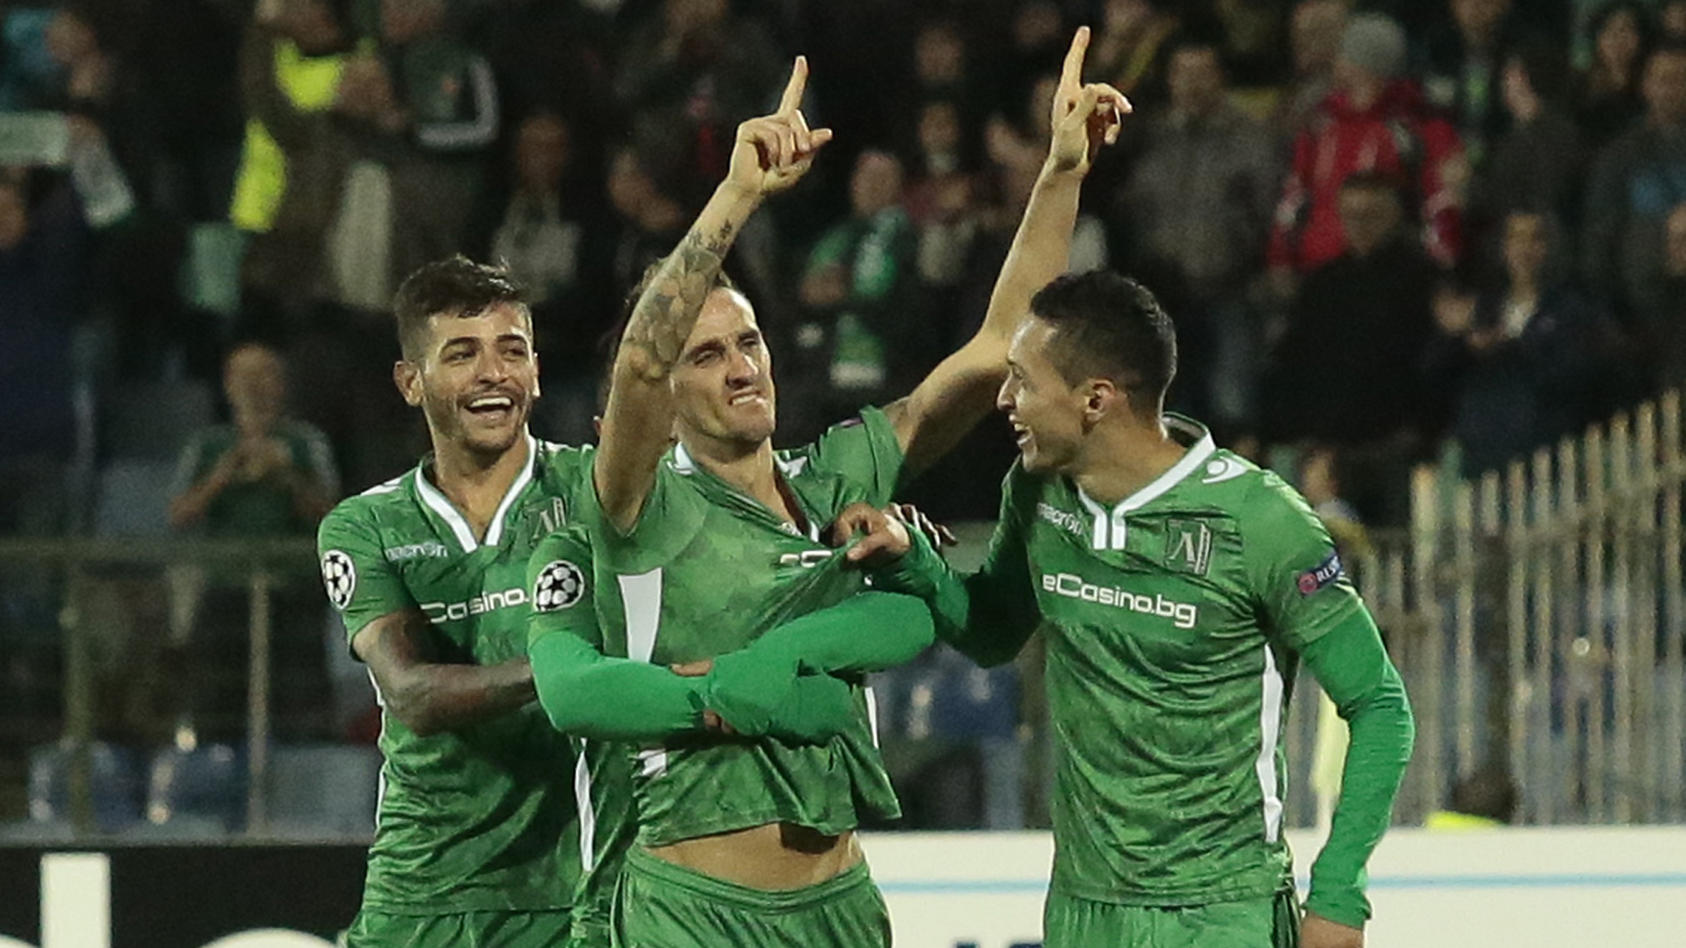 Bulgaria Soccer Champions League